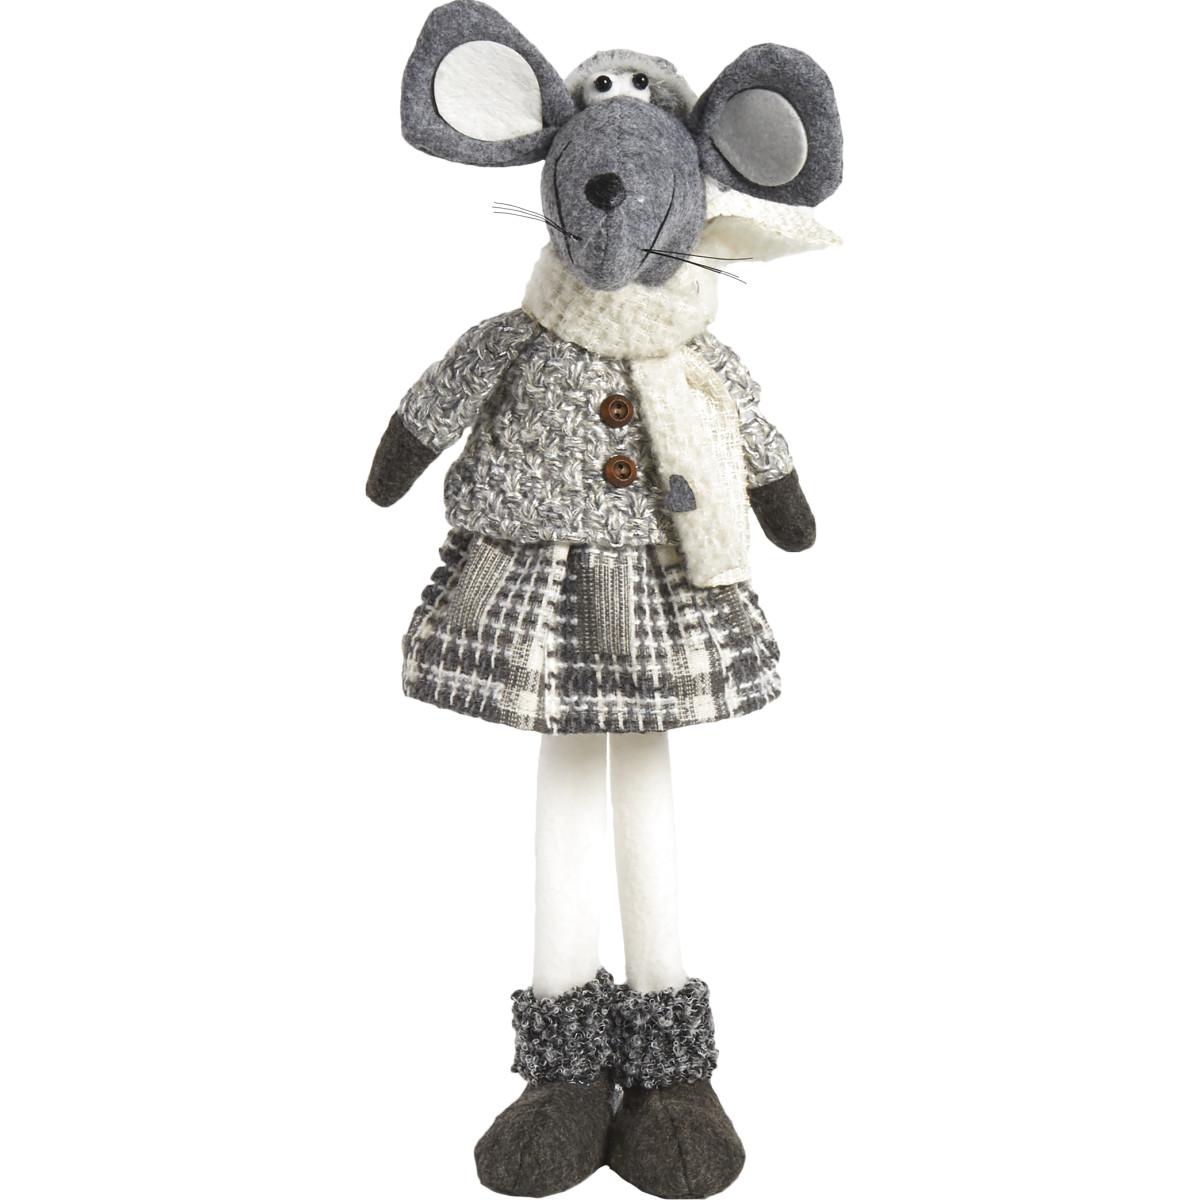 Мягкая Игрушка Мышка Серая 54